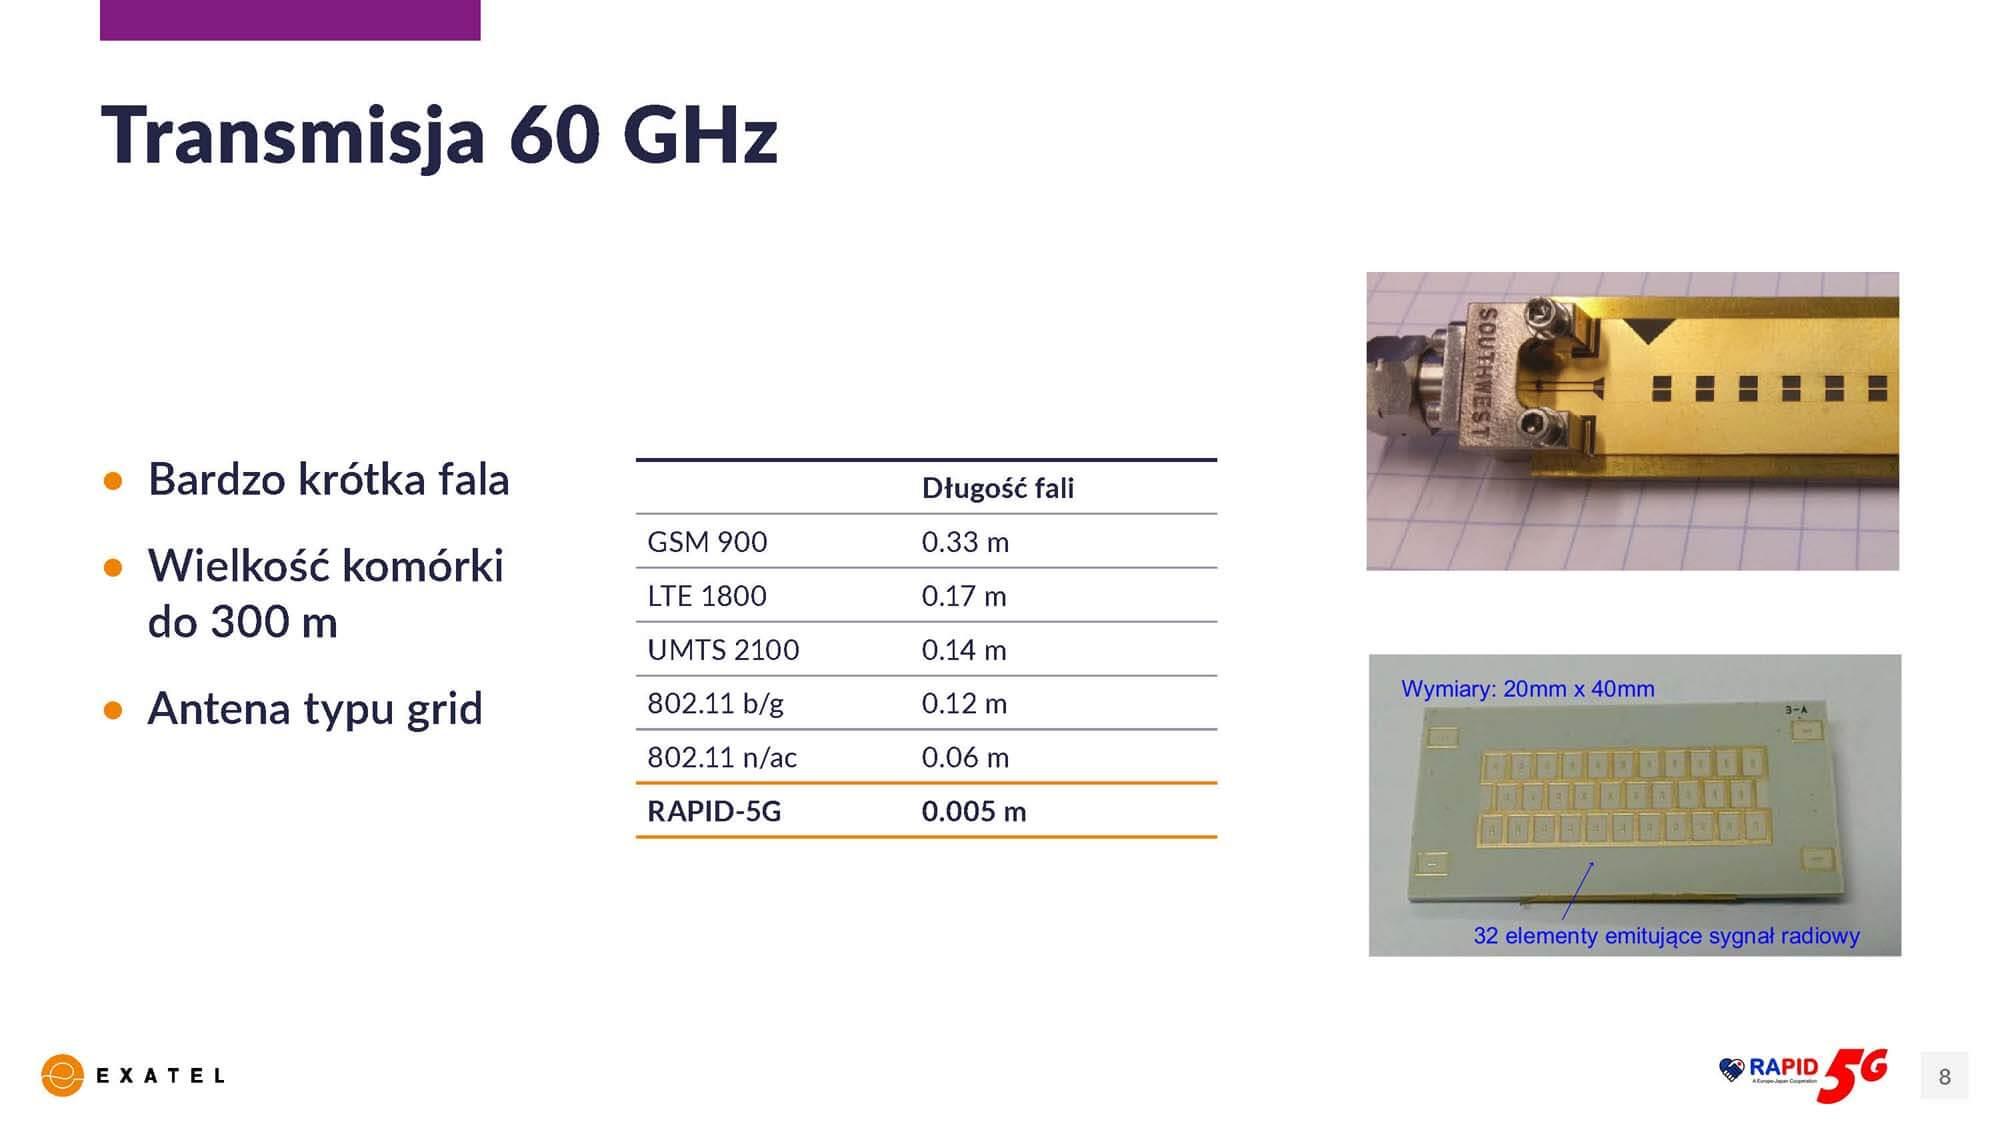 Rapid 5G Exatel